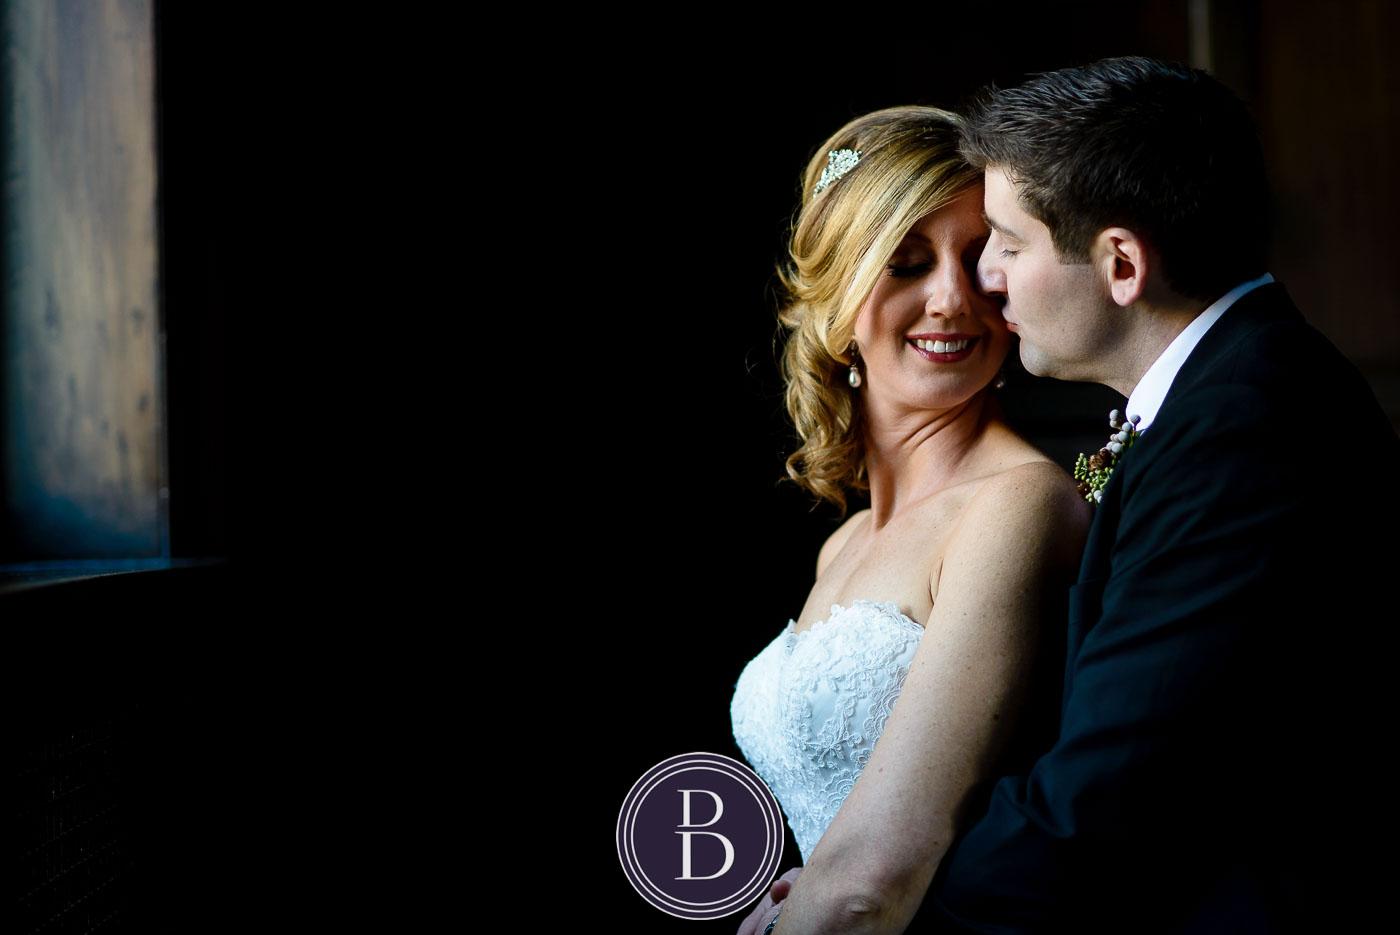 Romantic kiss bride groom Hamilton building